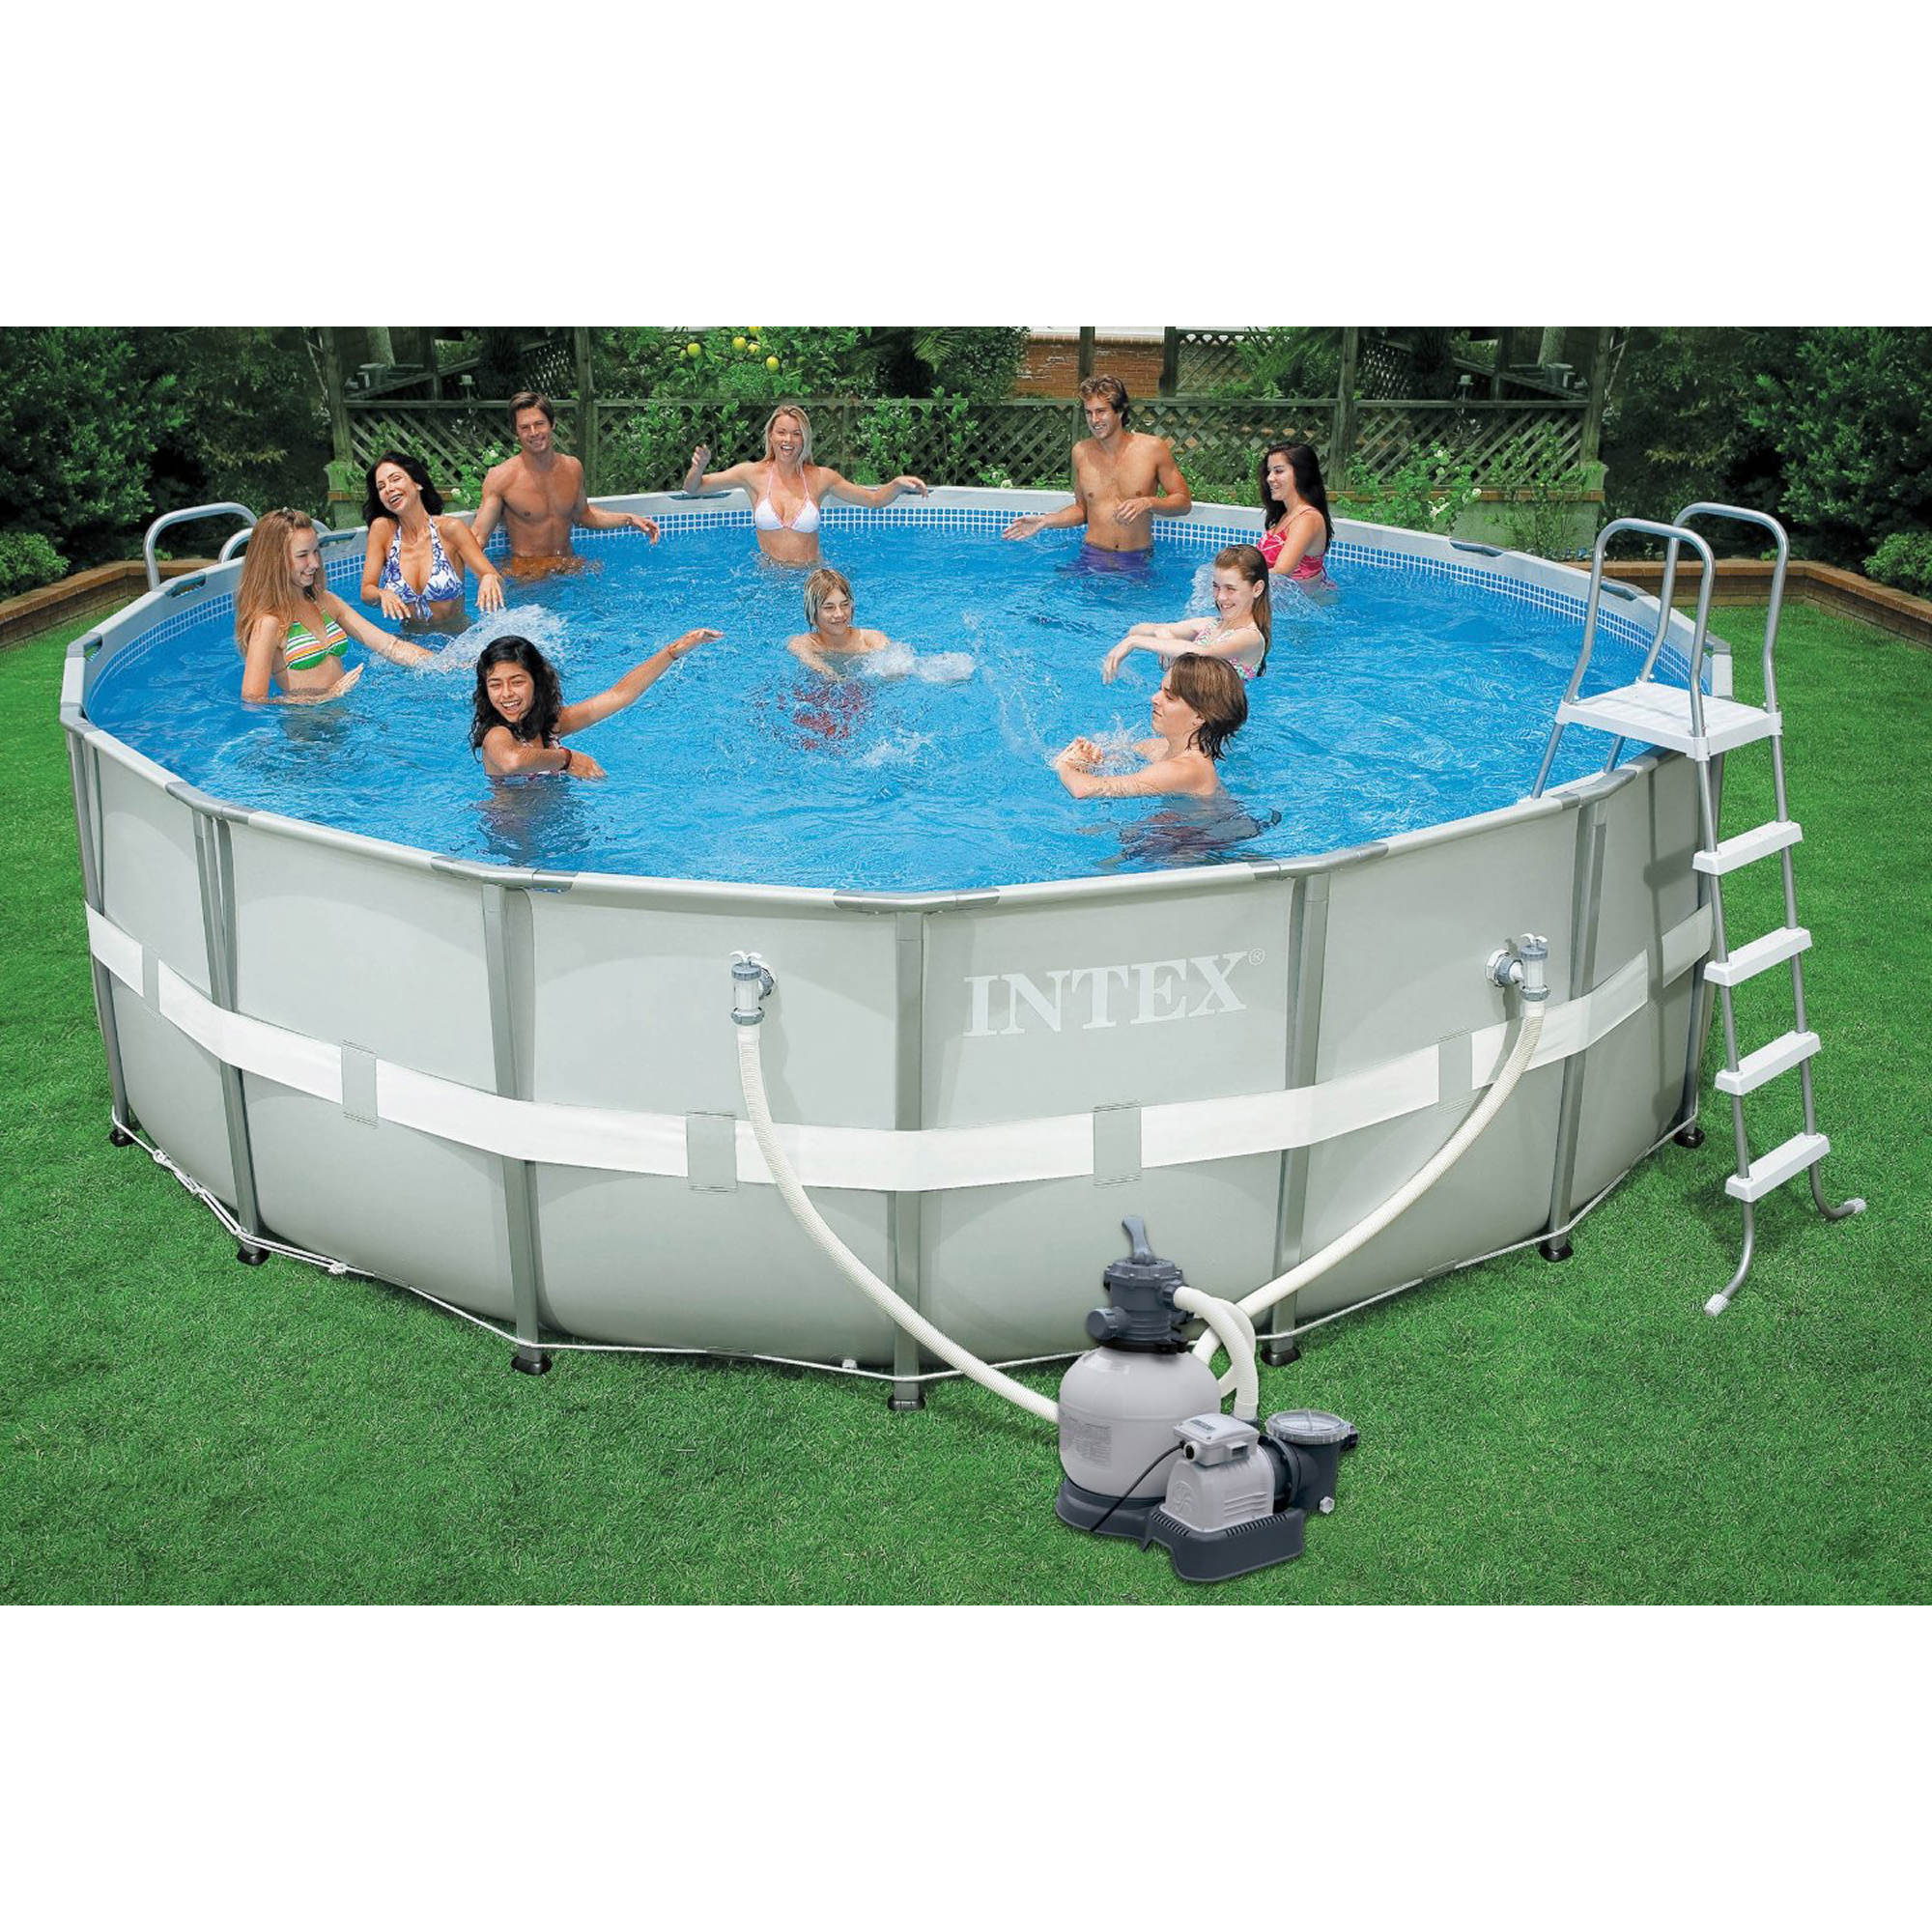 Intex 18 X 52 Quot Round Aboveground Ultra Frame Pool Bj S